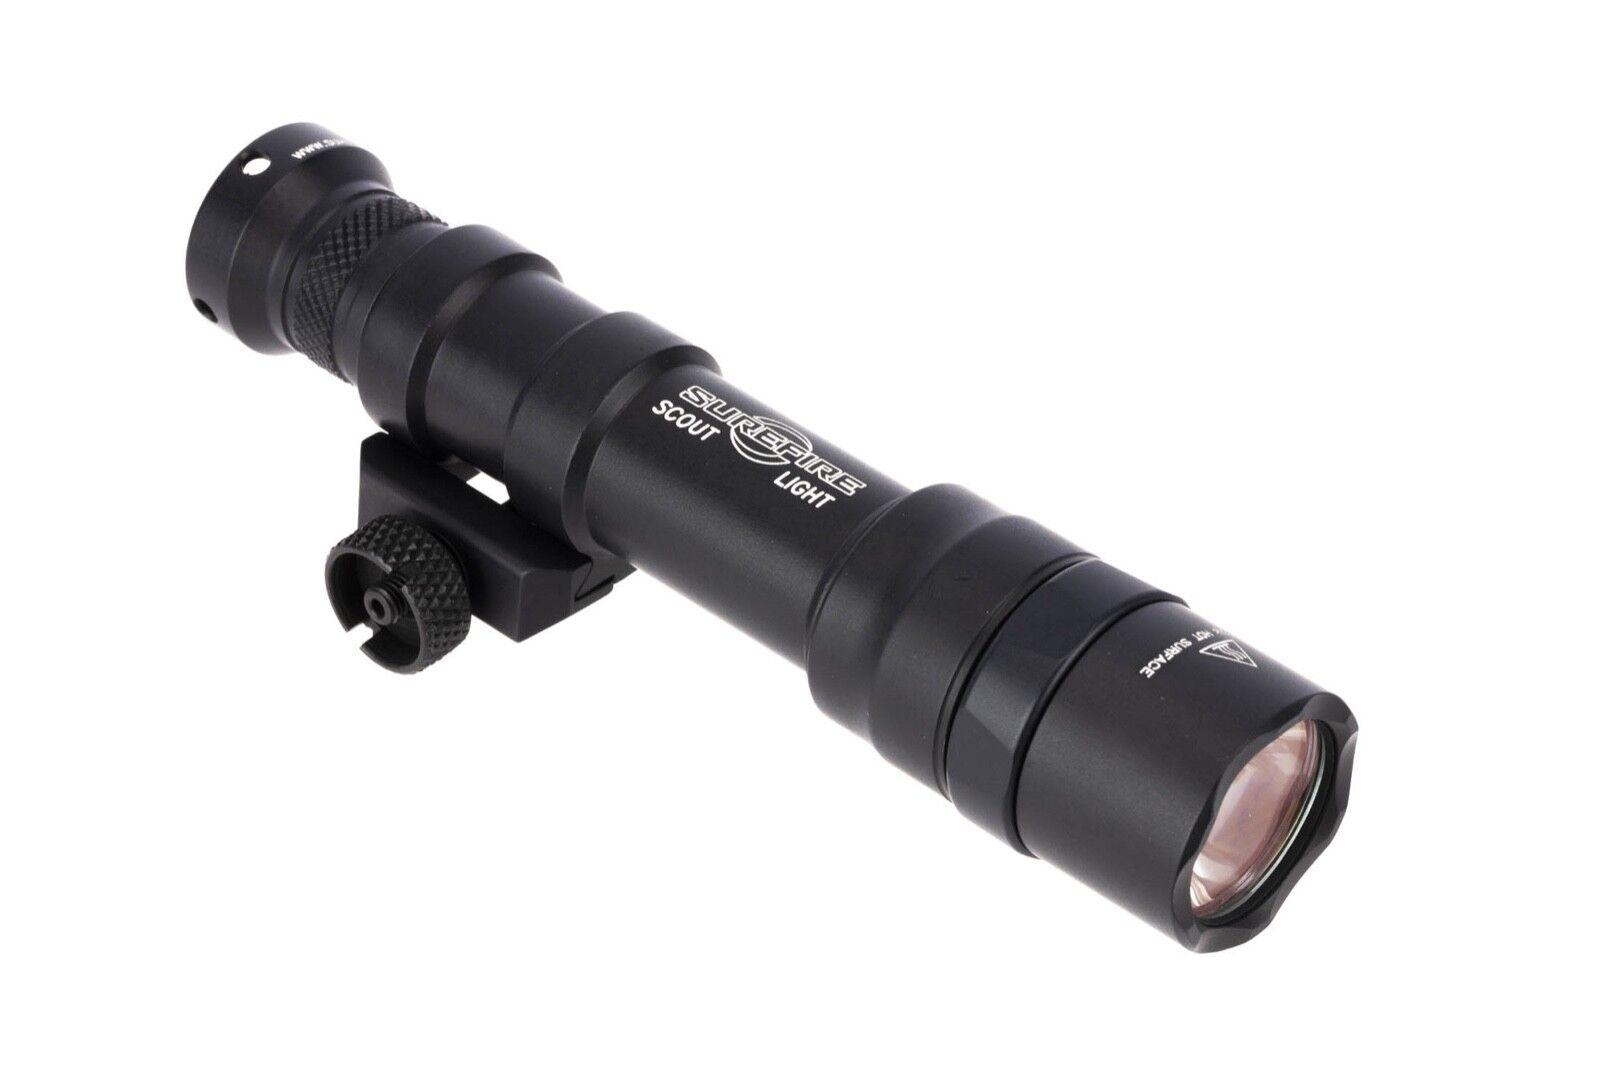 SureFire M600DF Ultra Scout arma antorcha Dual Fuel 1500 lúmenes M600DF-BK